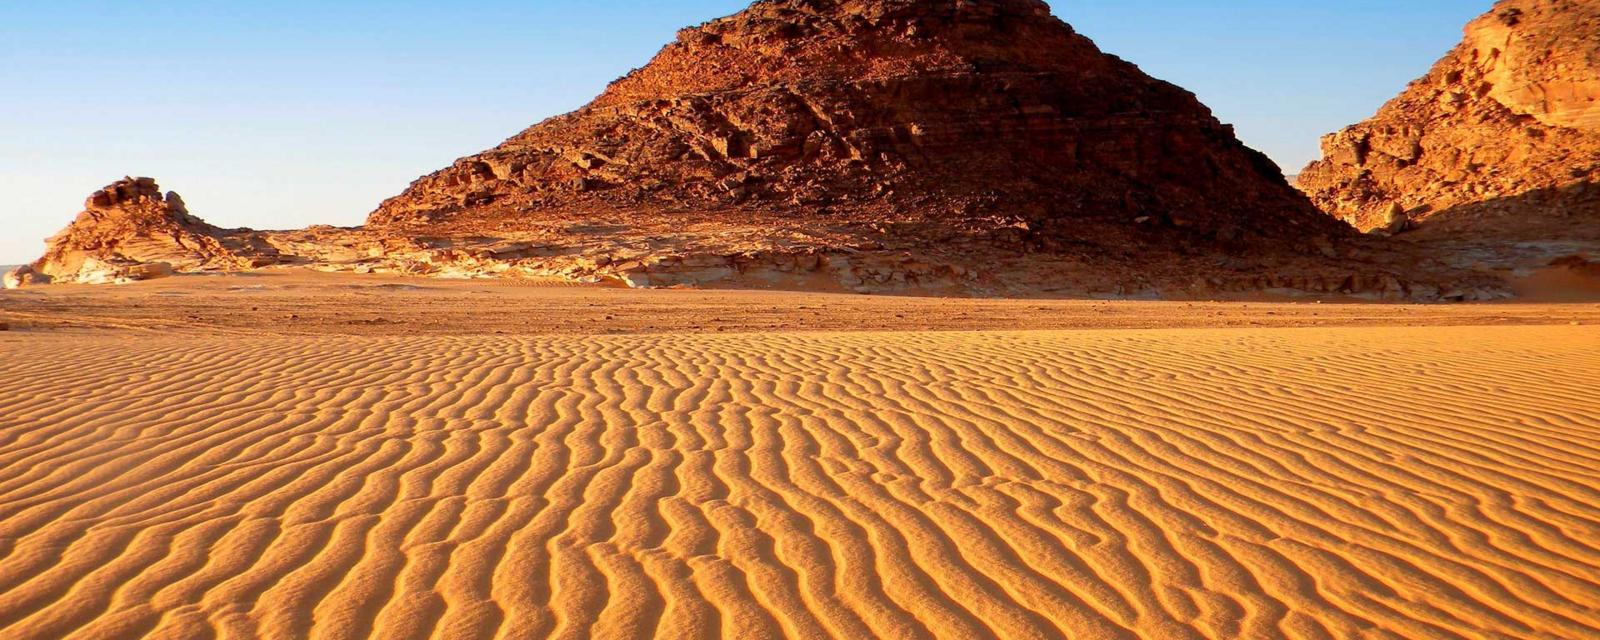 Simple Solar Power Systems Desert Wilderness Community